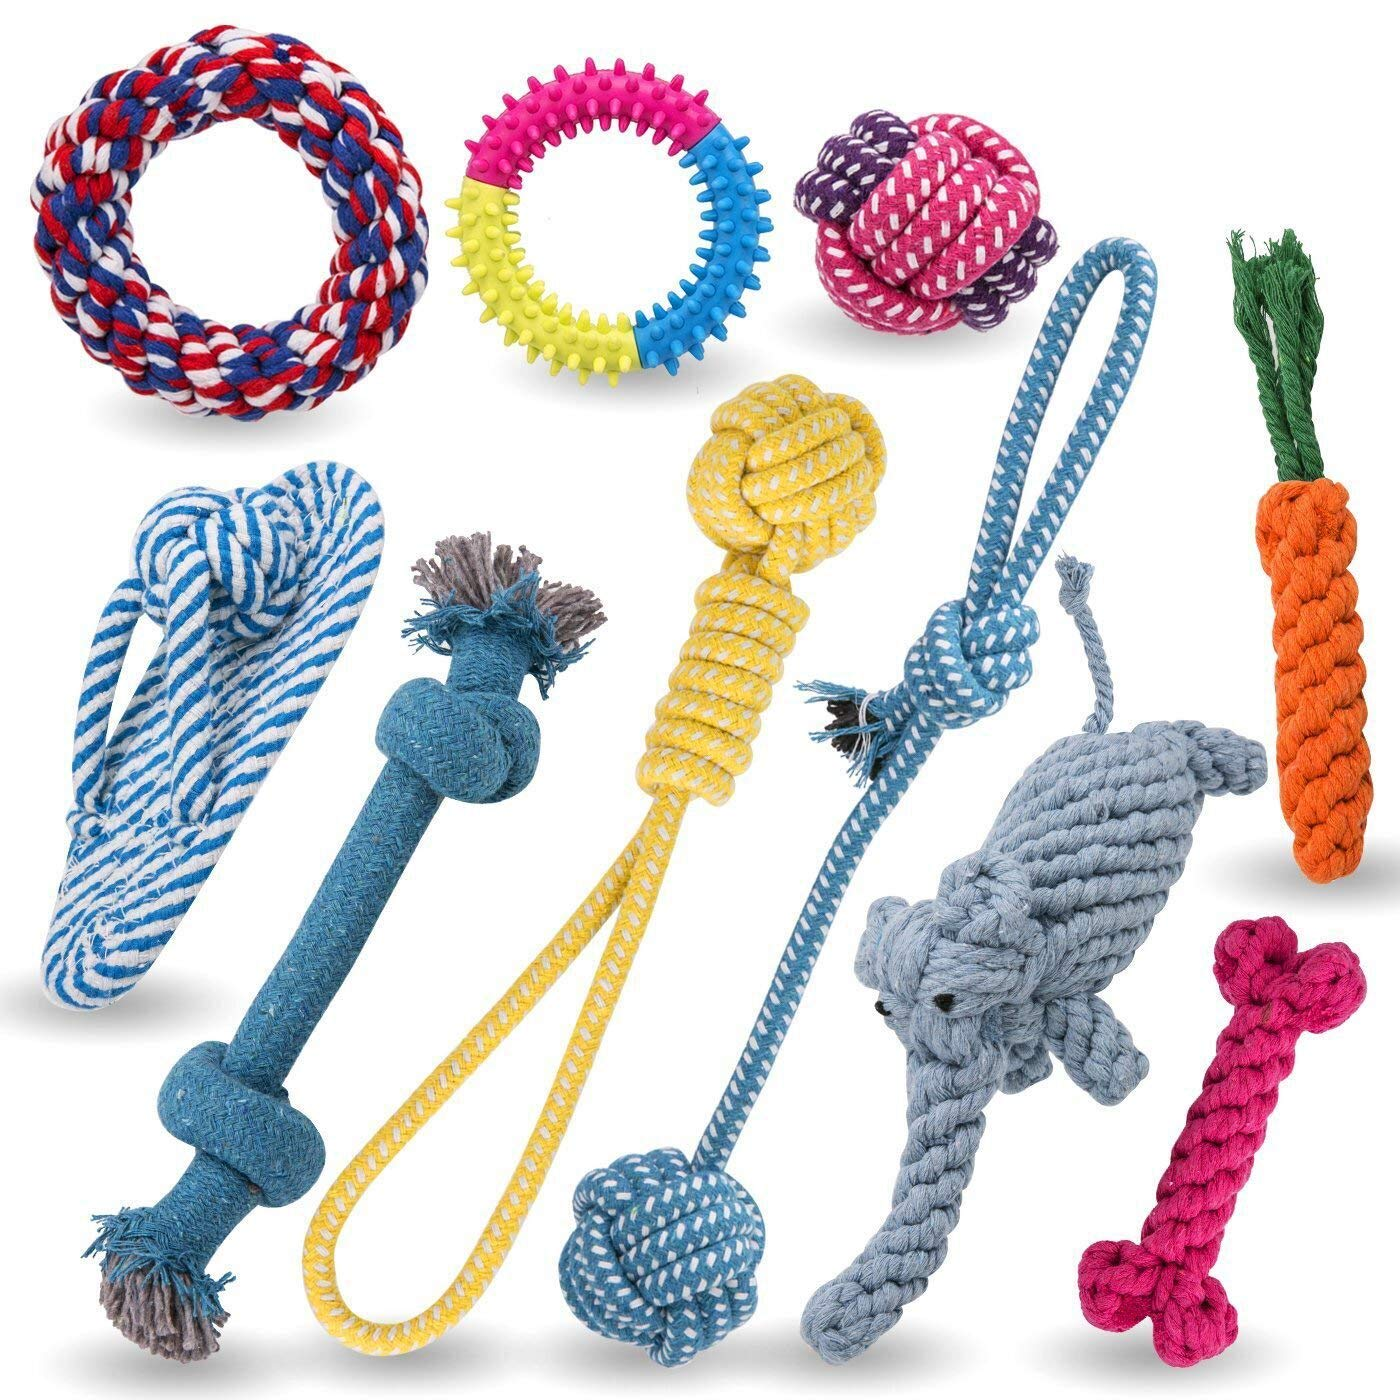 Dog  rope Chew Toys - 10 Set - Jekeno Dog Bones Ball Rope for Puppy Small  Dog